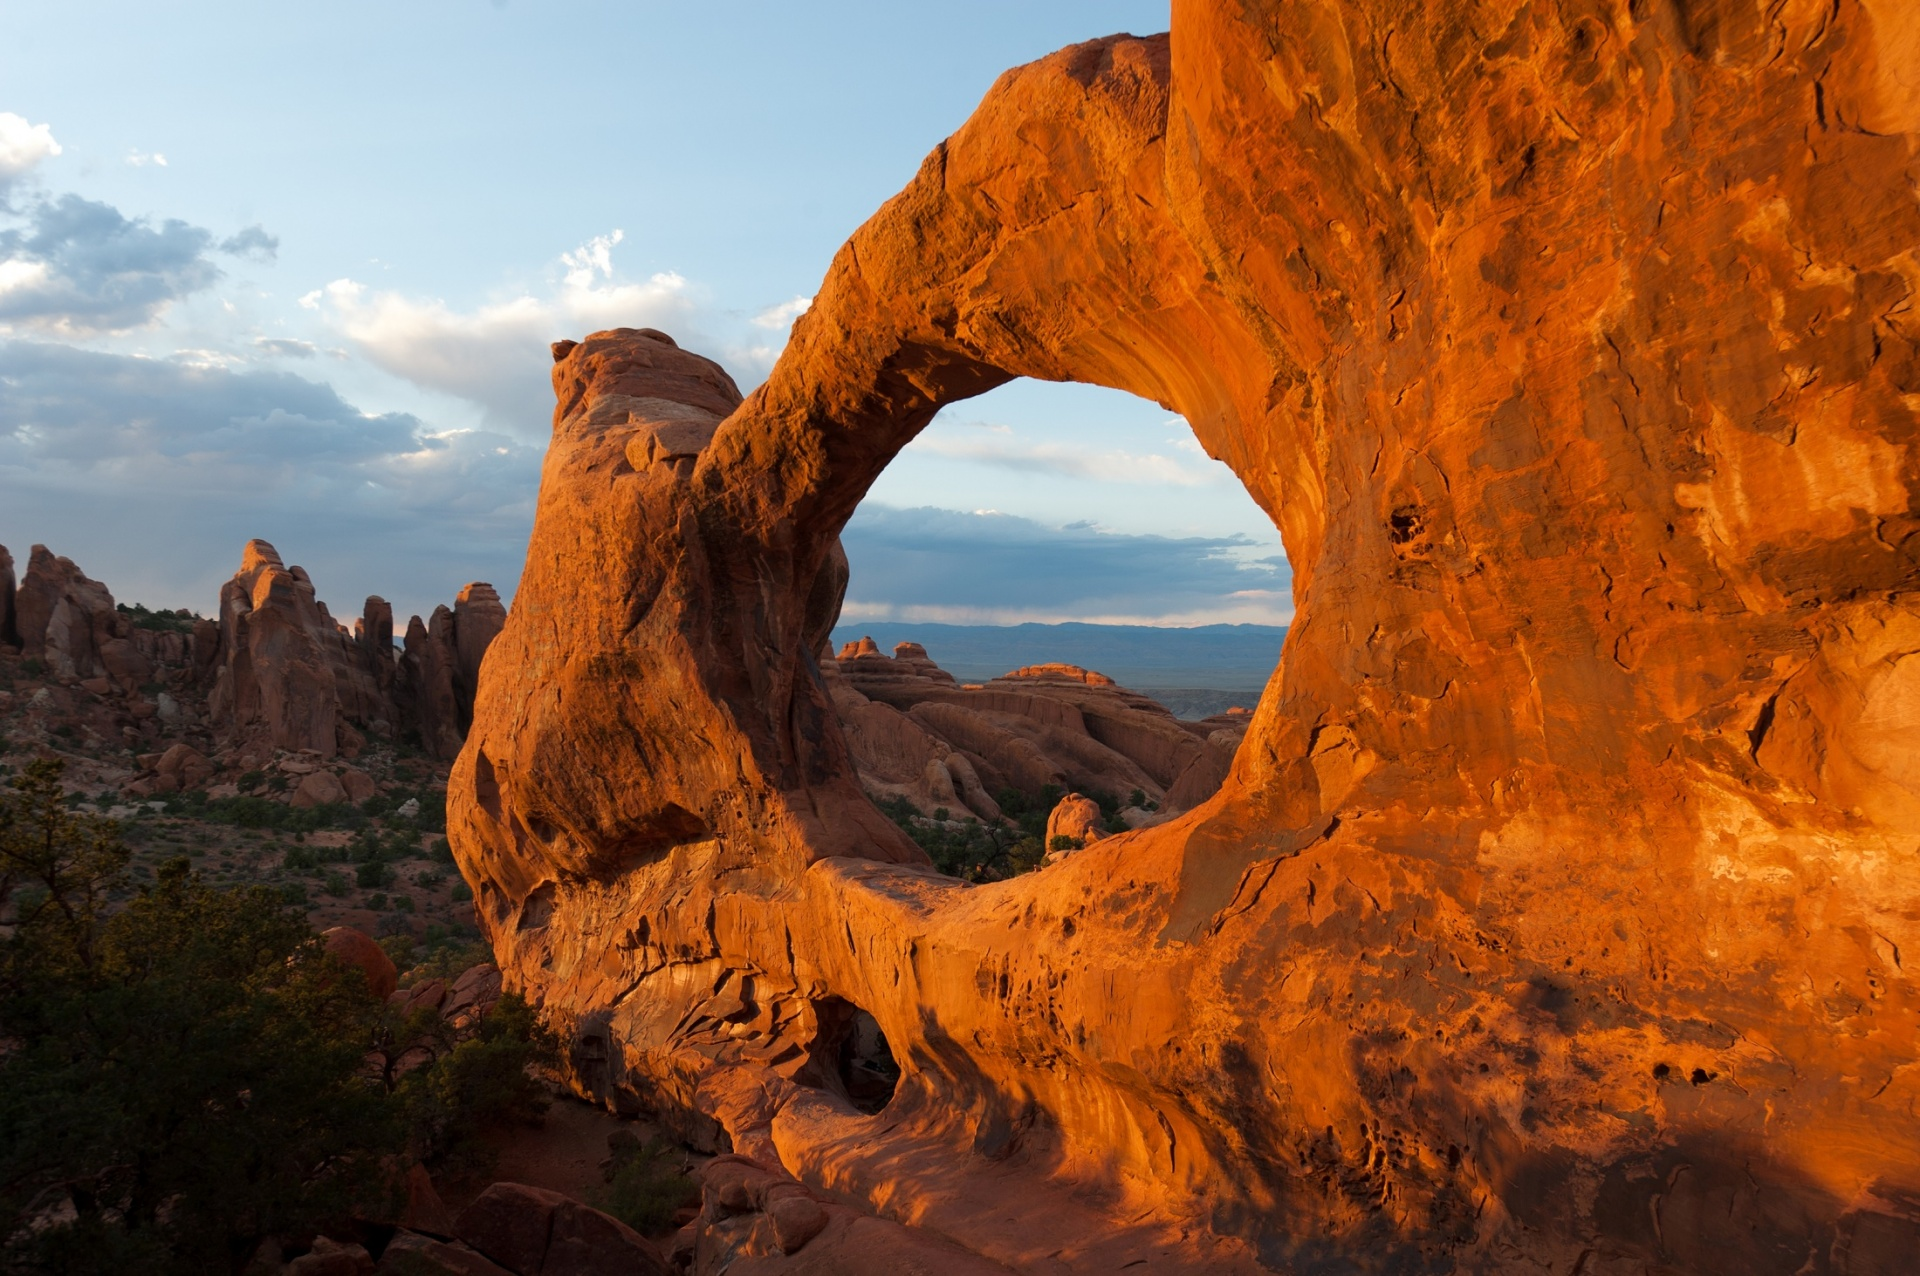 national parks, parks and recreation month, landscape